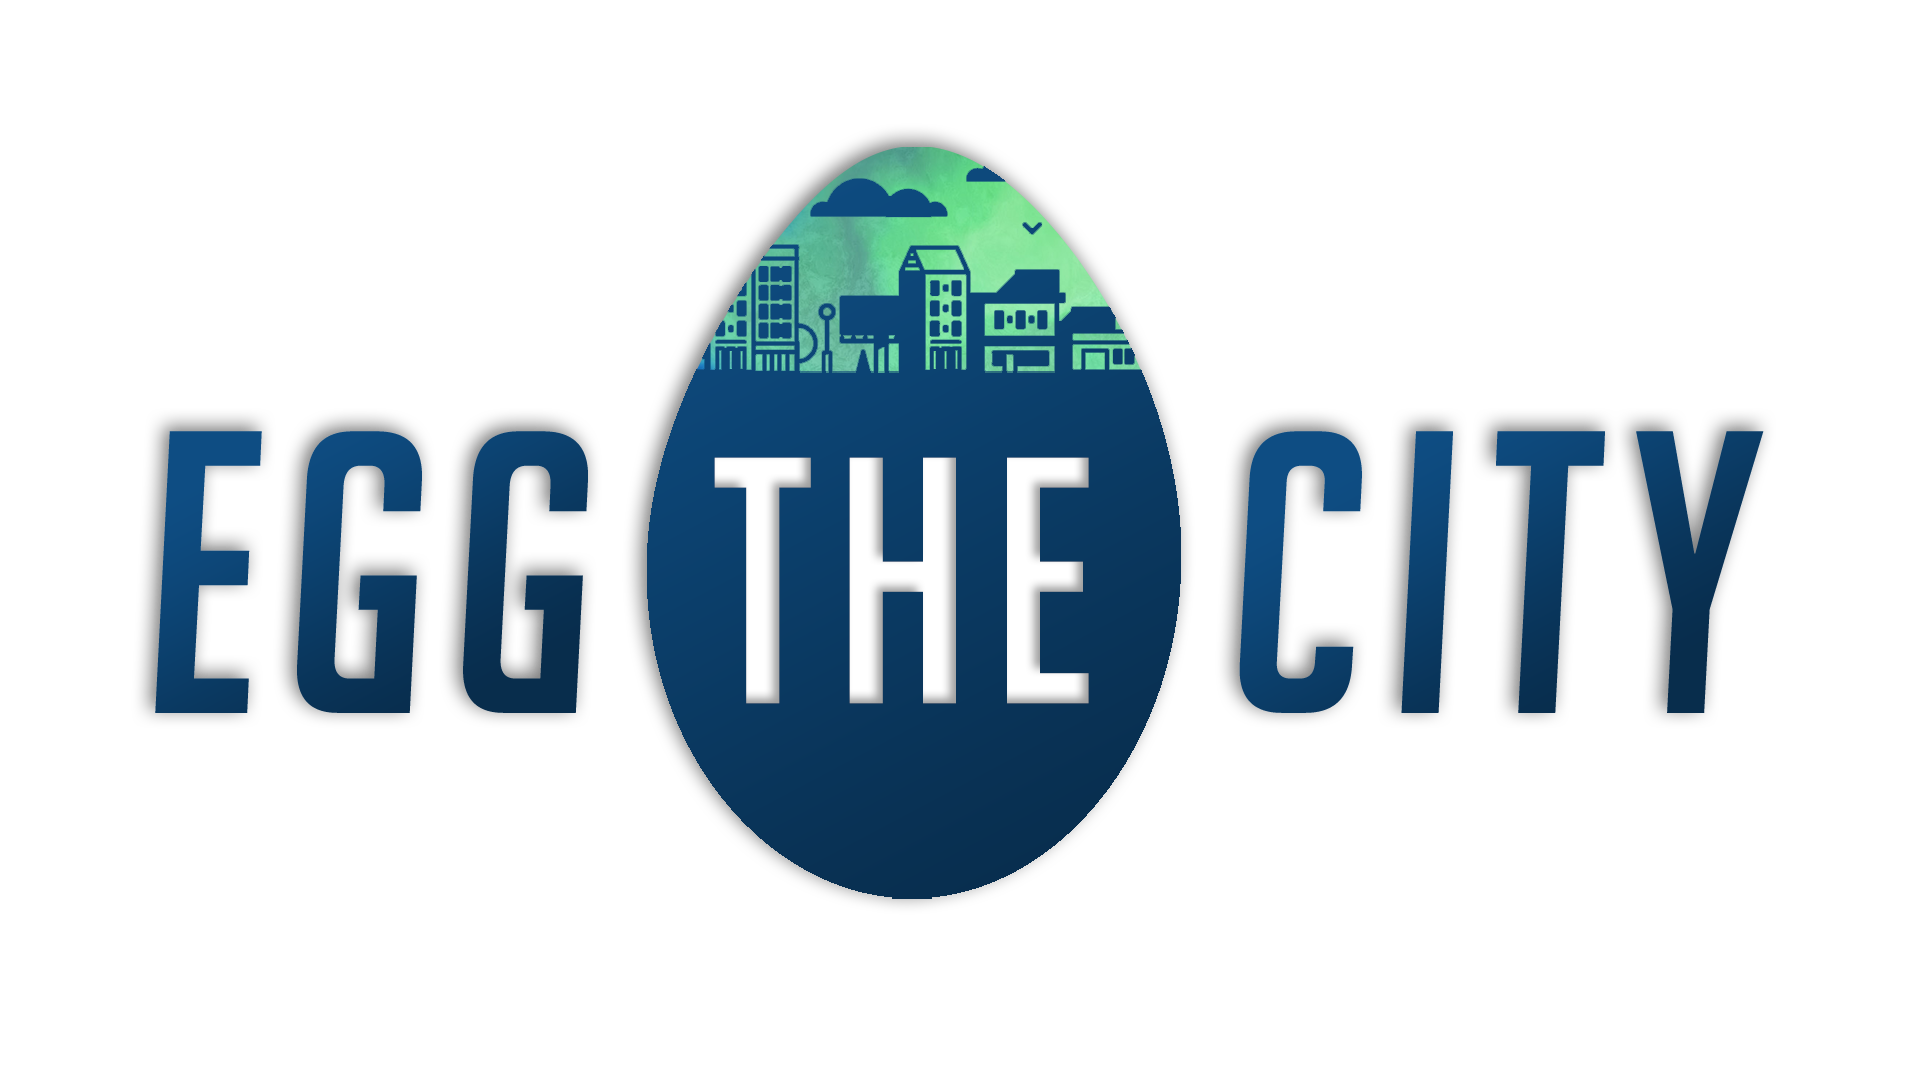 TPC Egg The City 19'.png